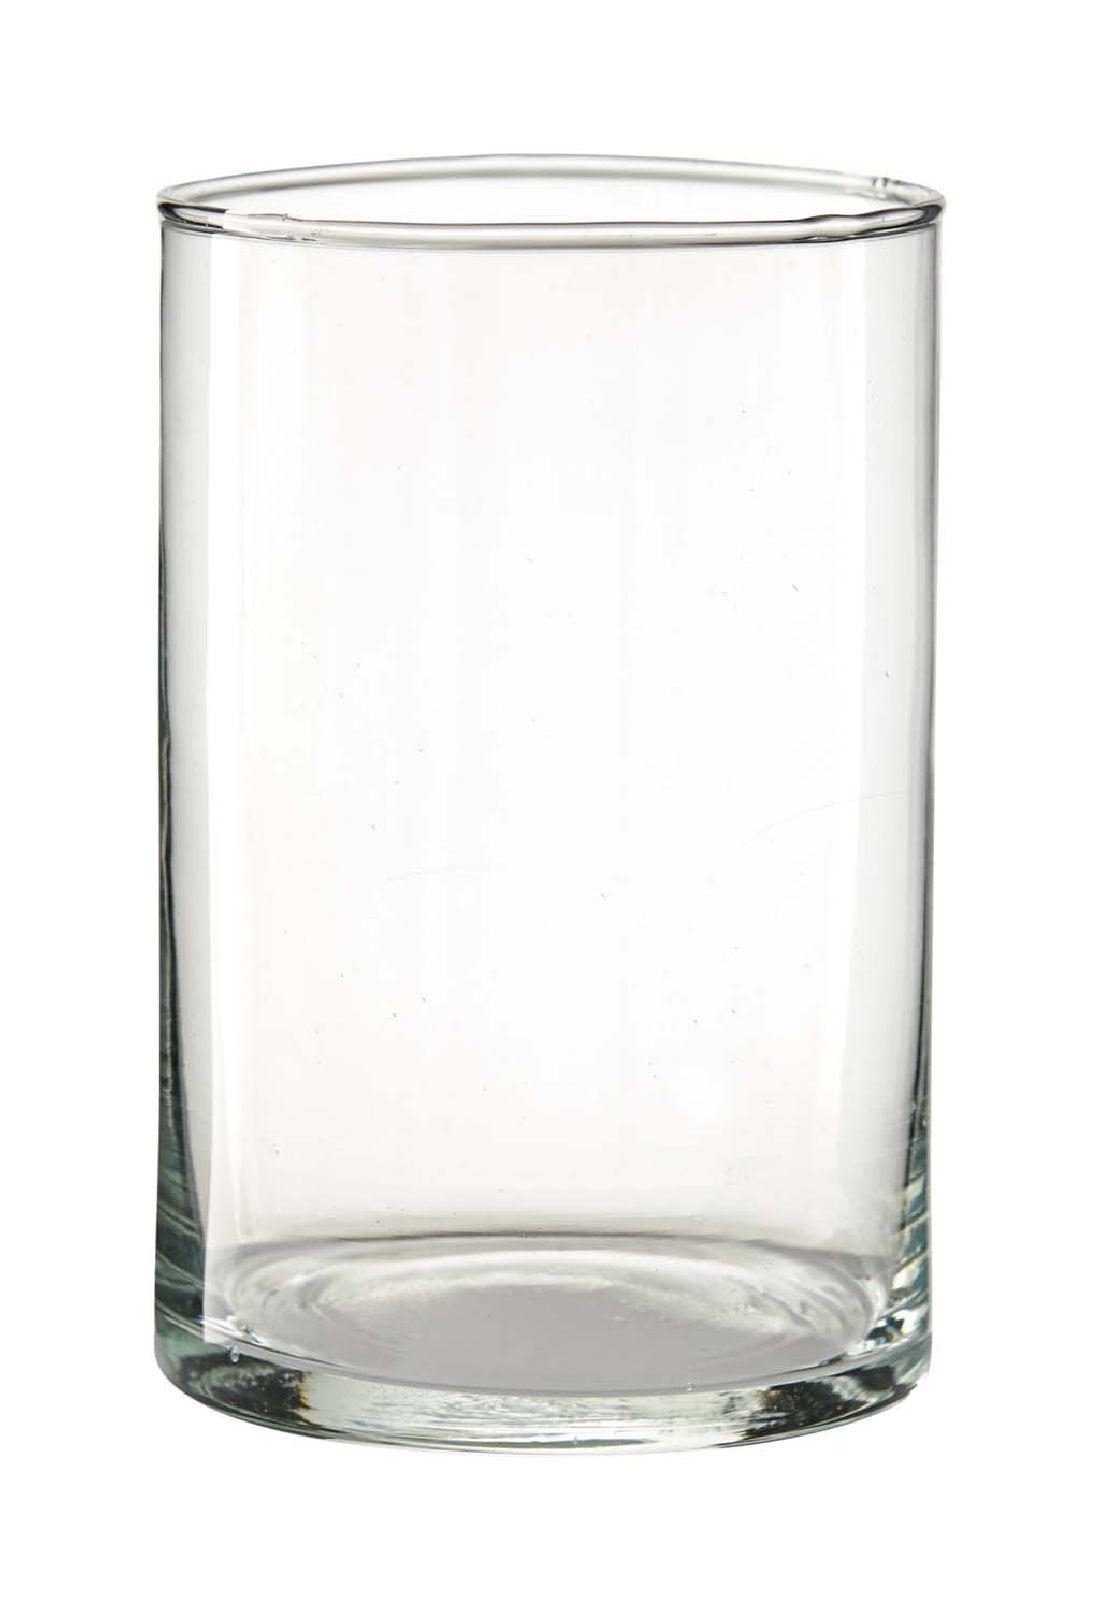 Zylinder Glas press KLAR 1850/15 Ø10cm x H15cm